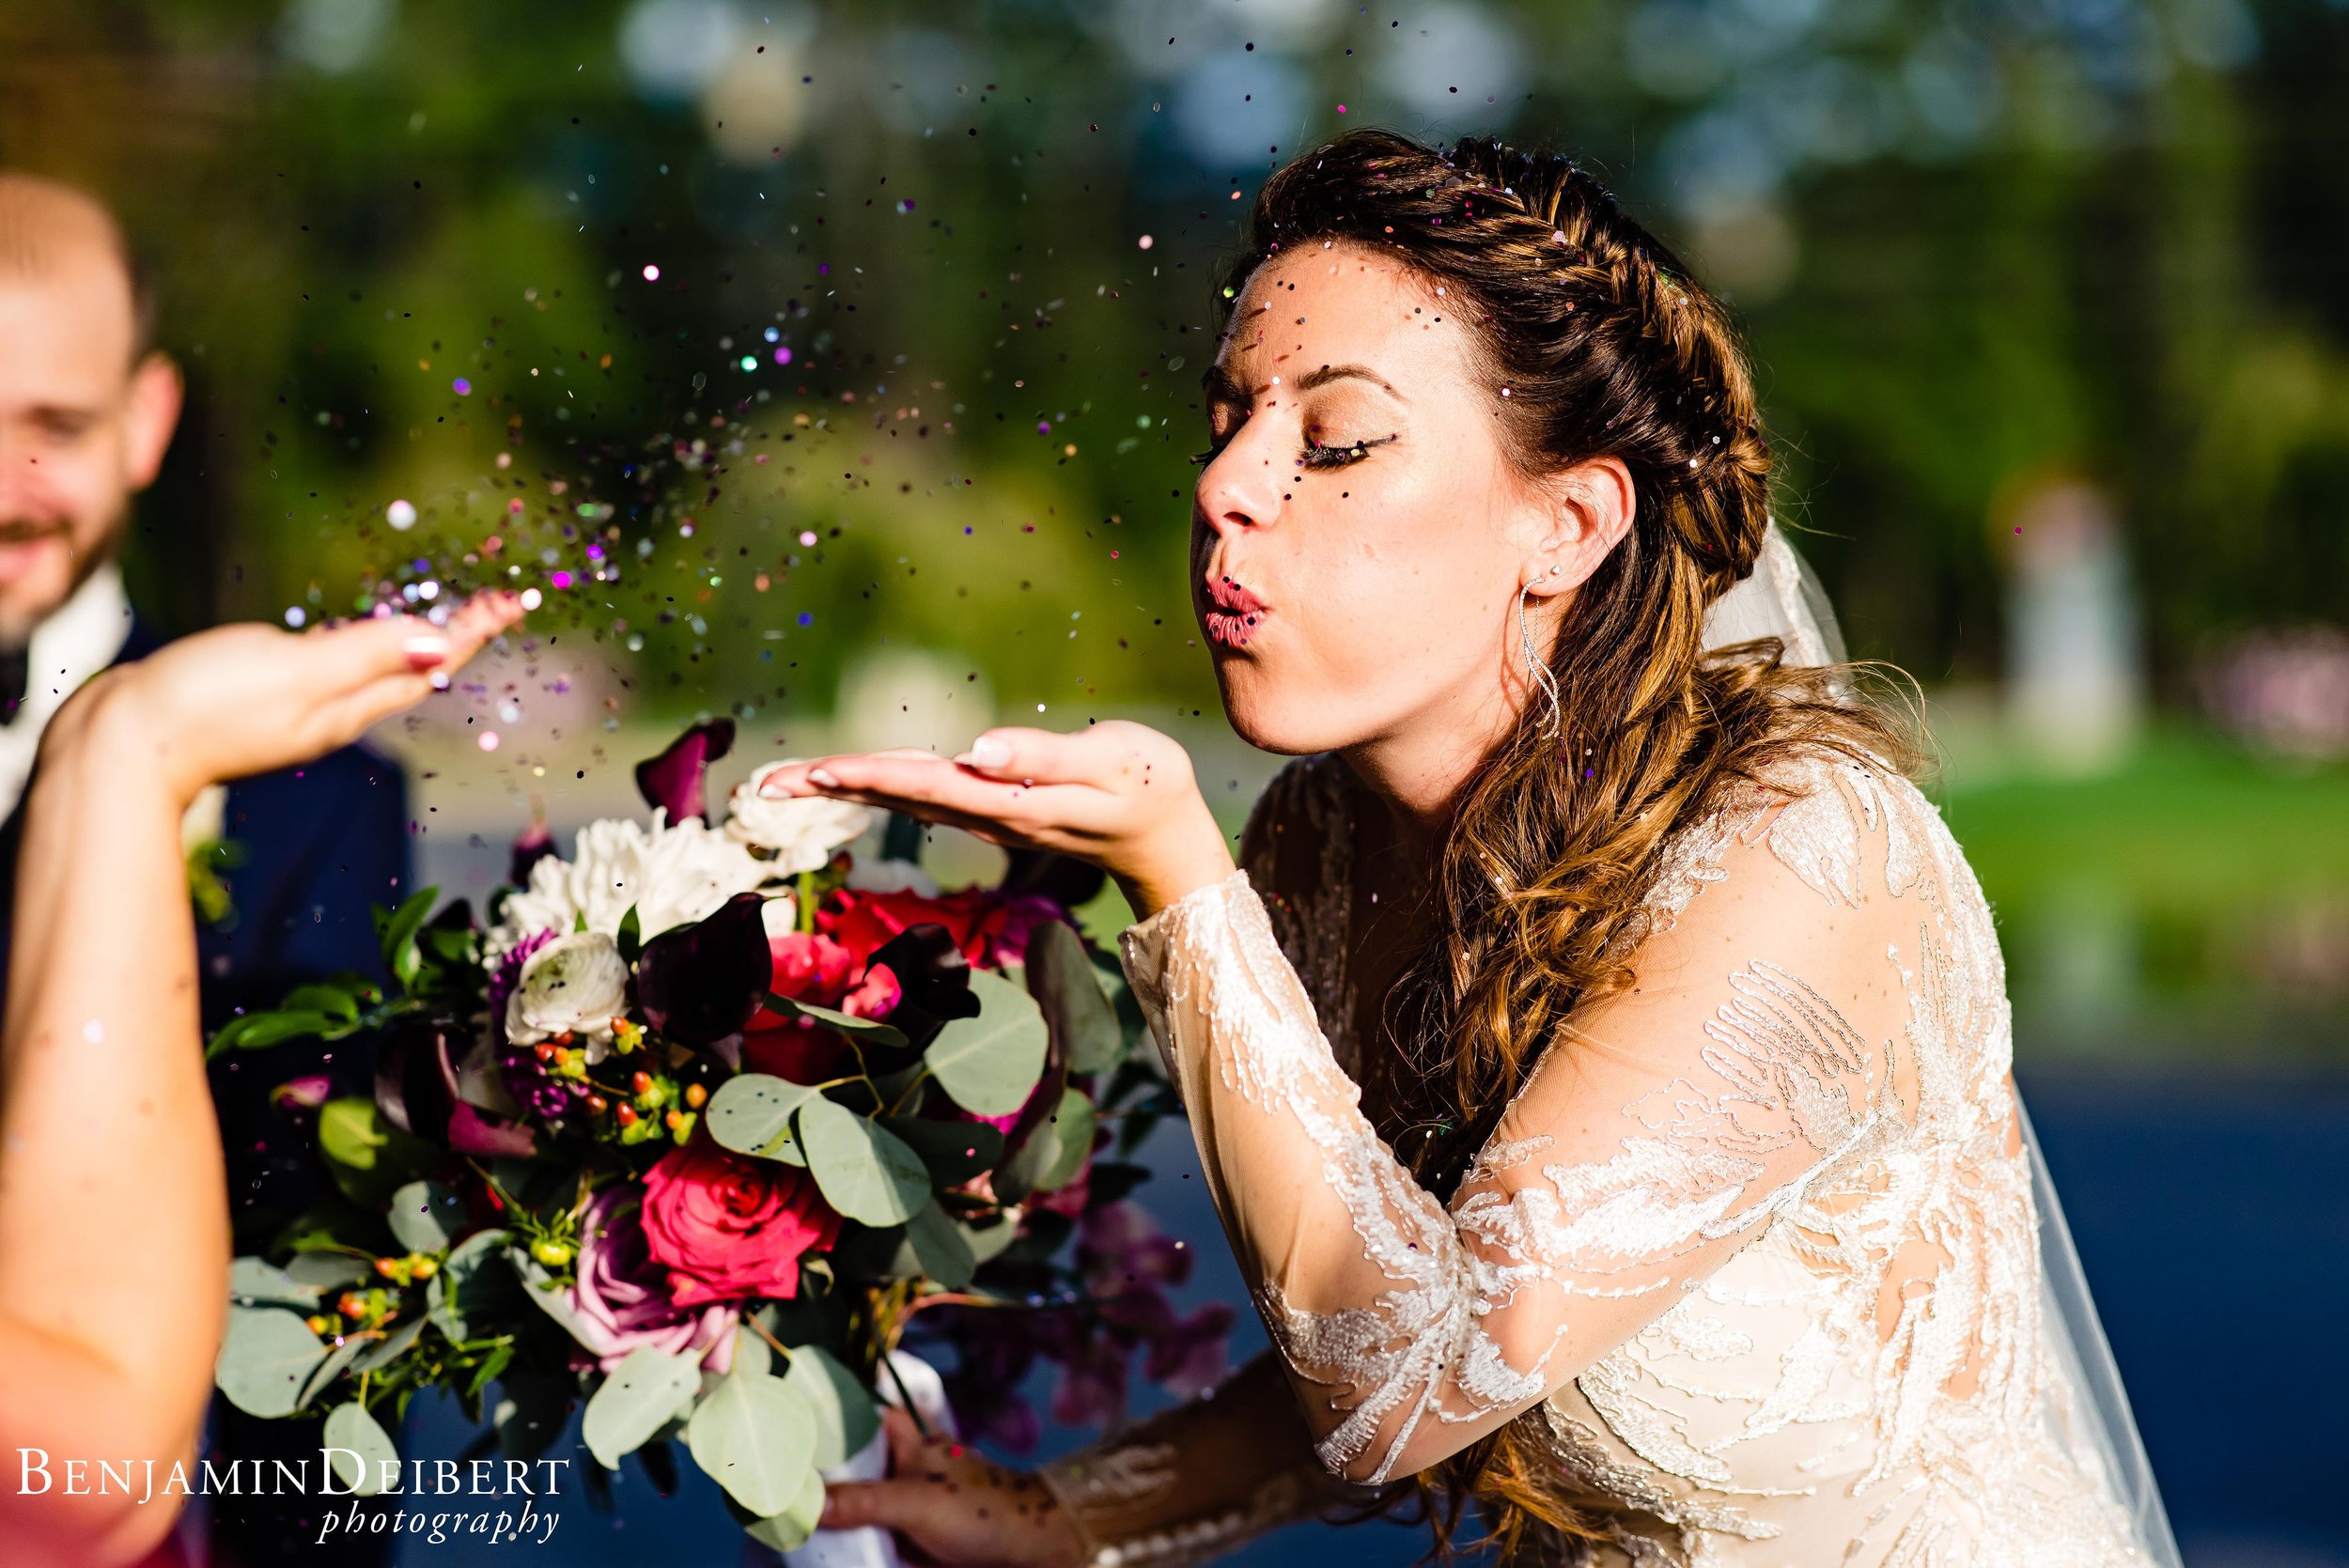 AmandaandElliott_TheCarriageHouse_Wedding-42.jpg